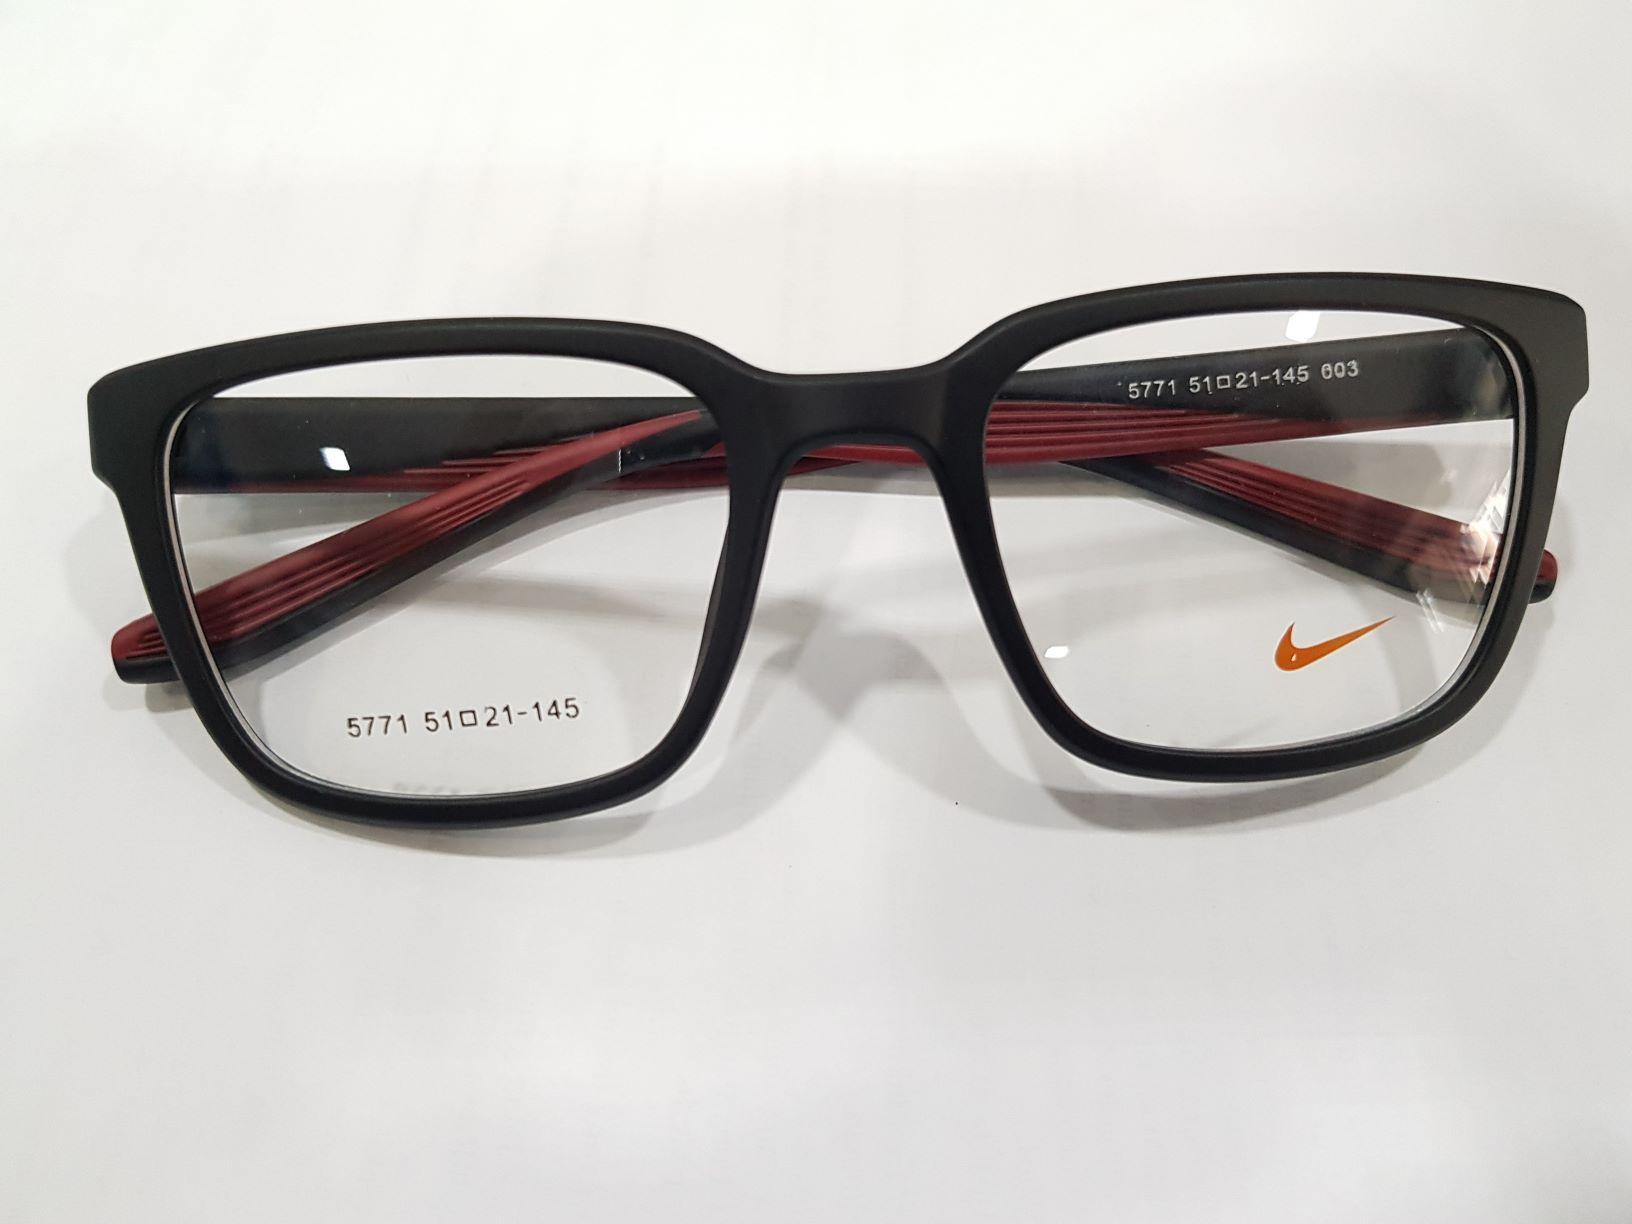 Frame kacamata Nike sport design + Lensa minus anti radiasi 9c8a336727